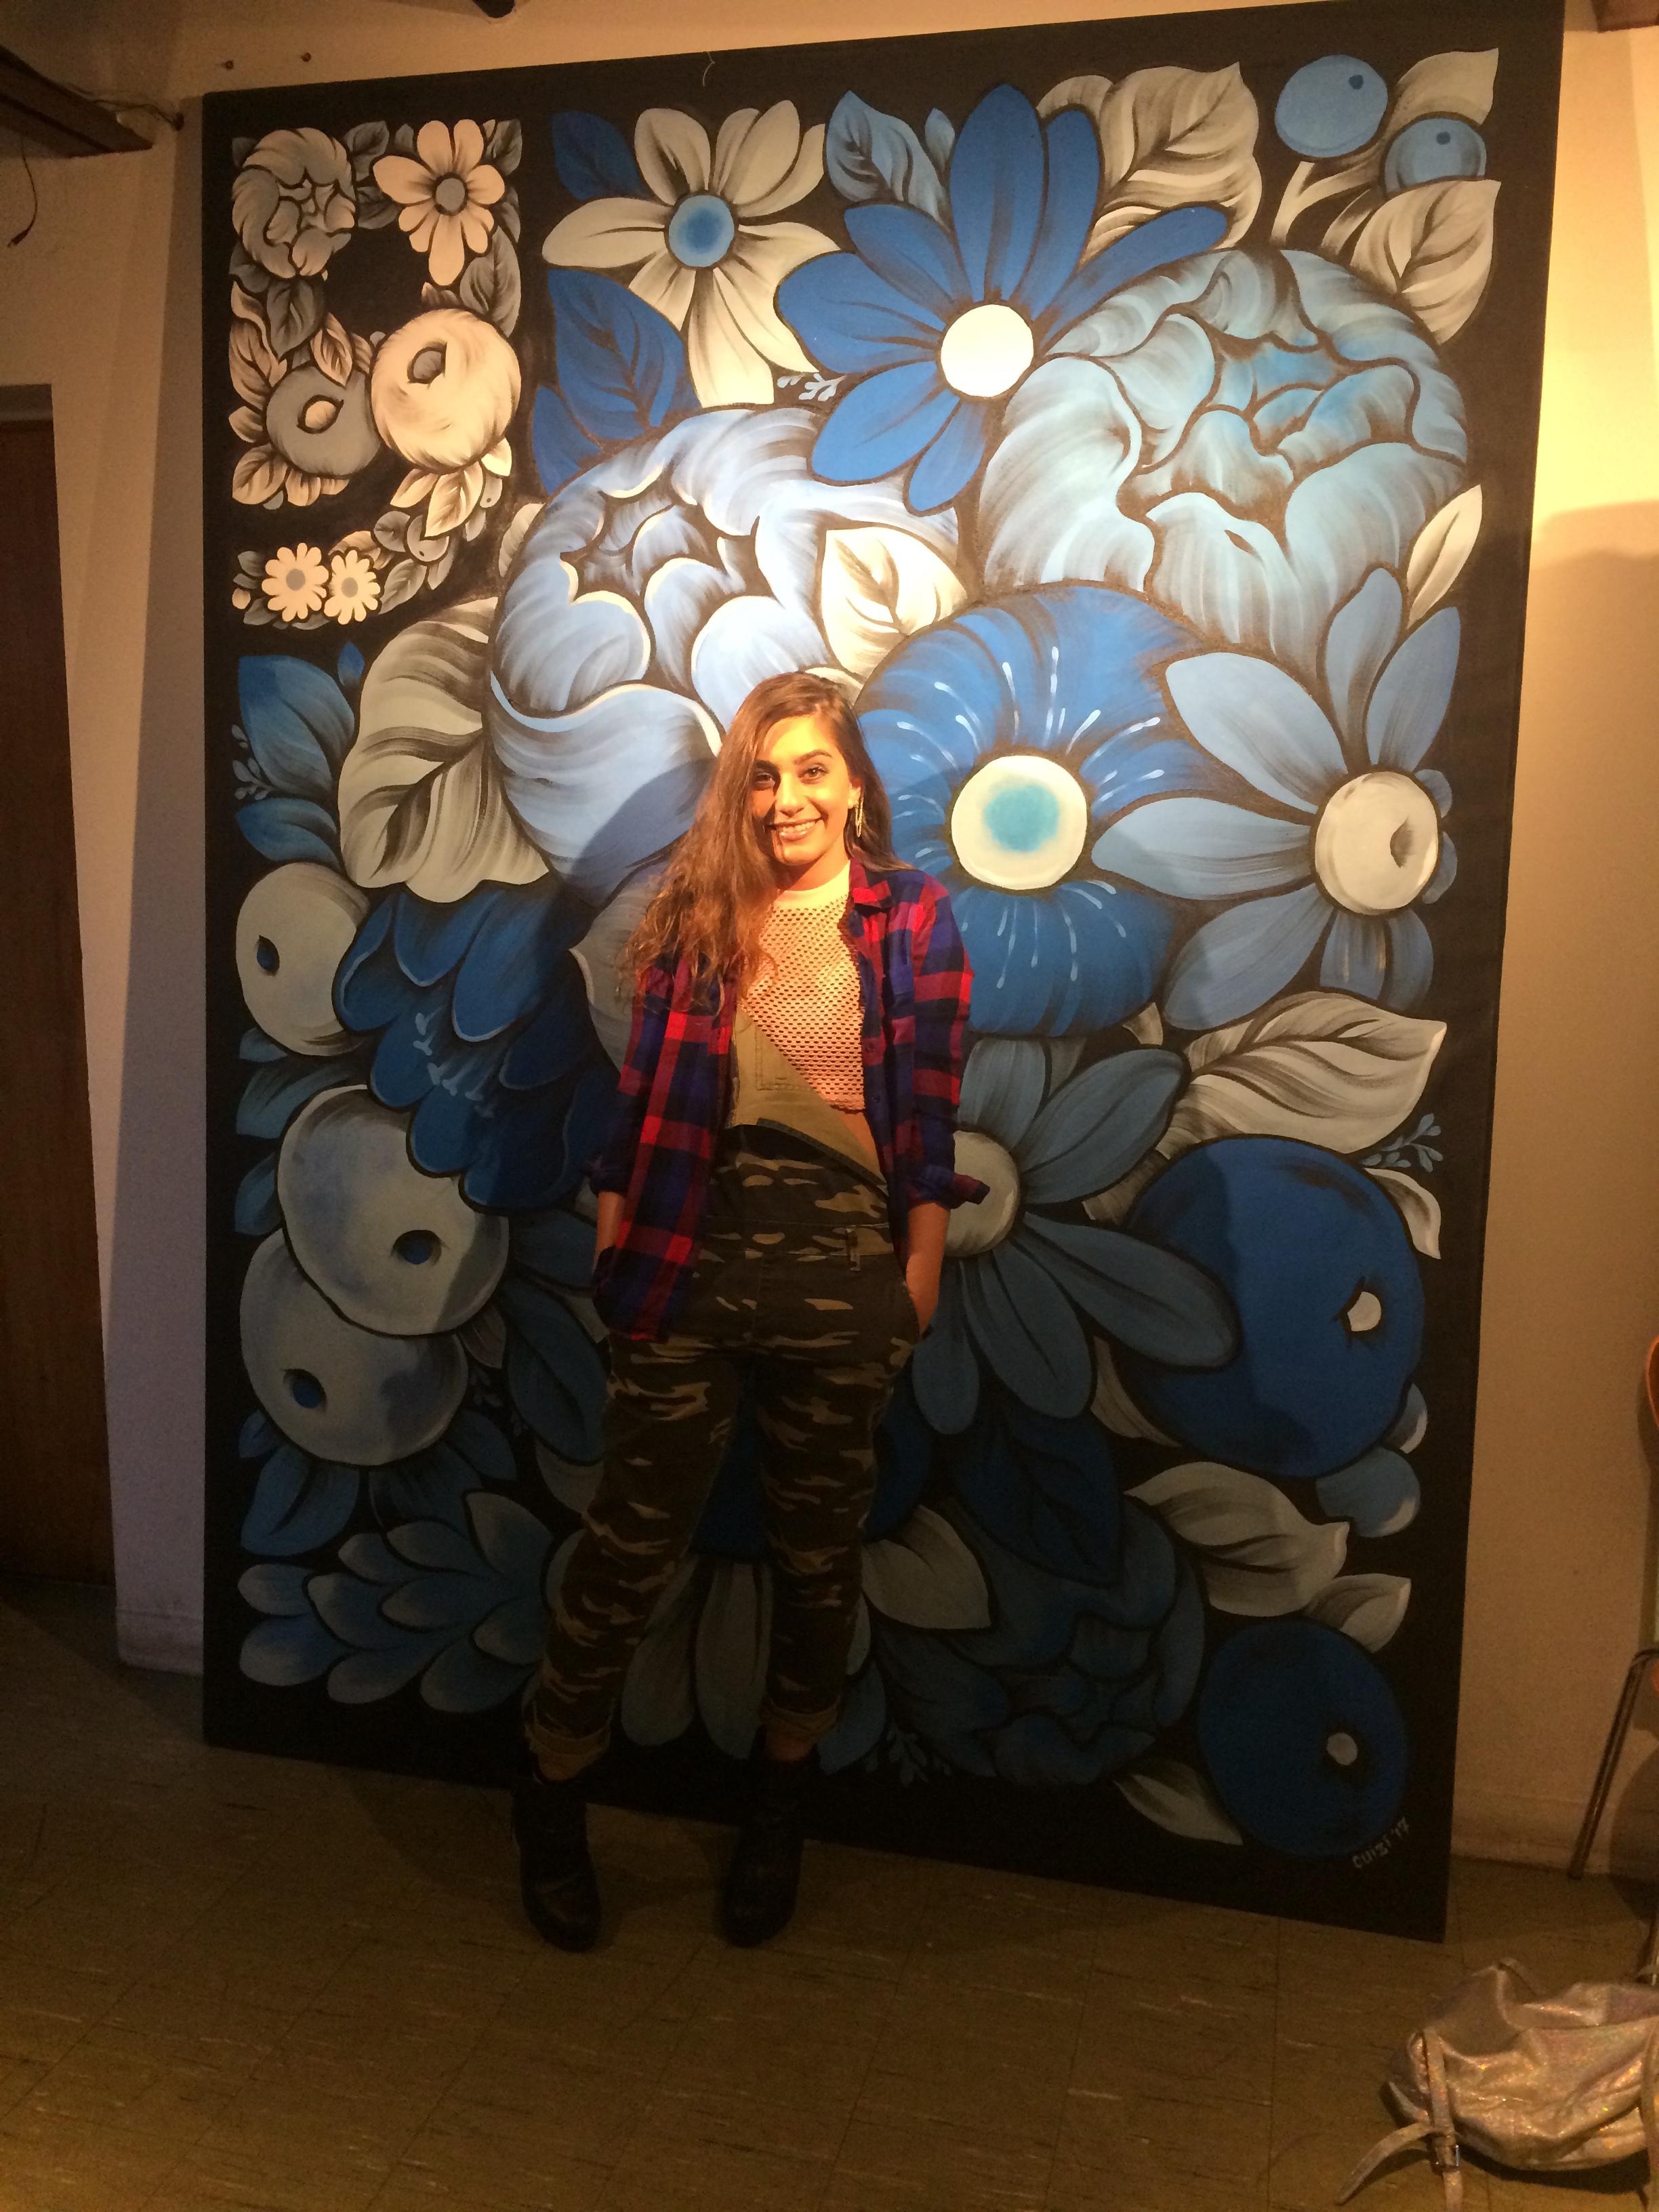 Sam Barba Modeling Her New Flannel